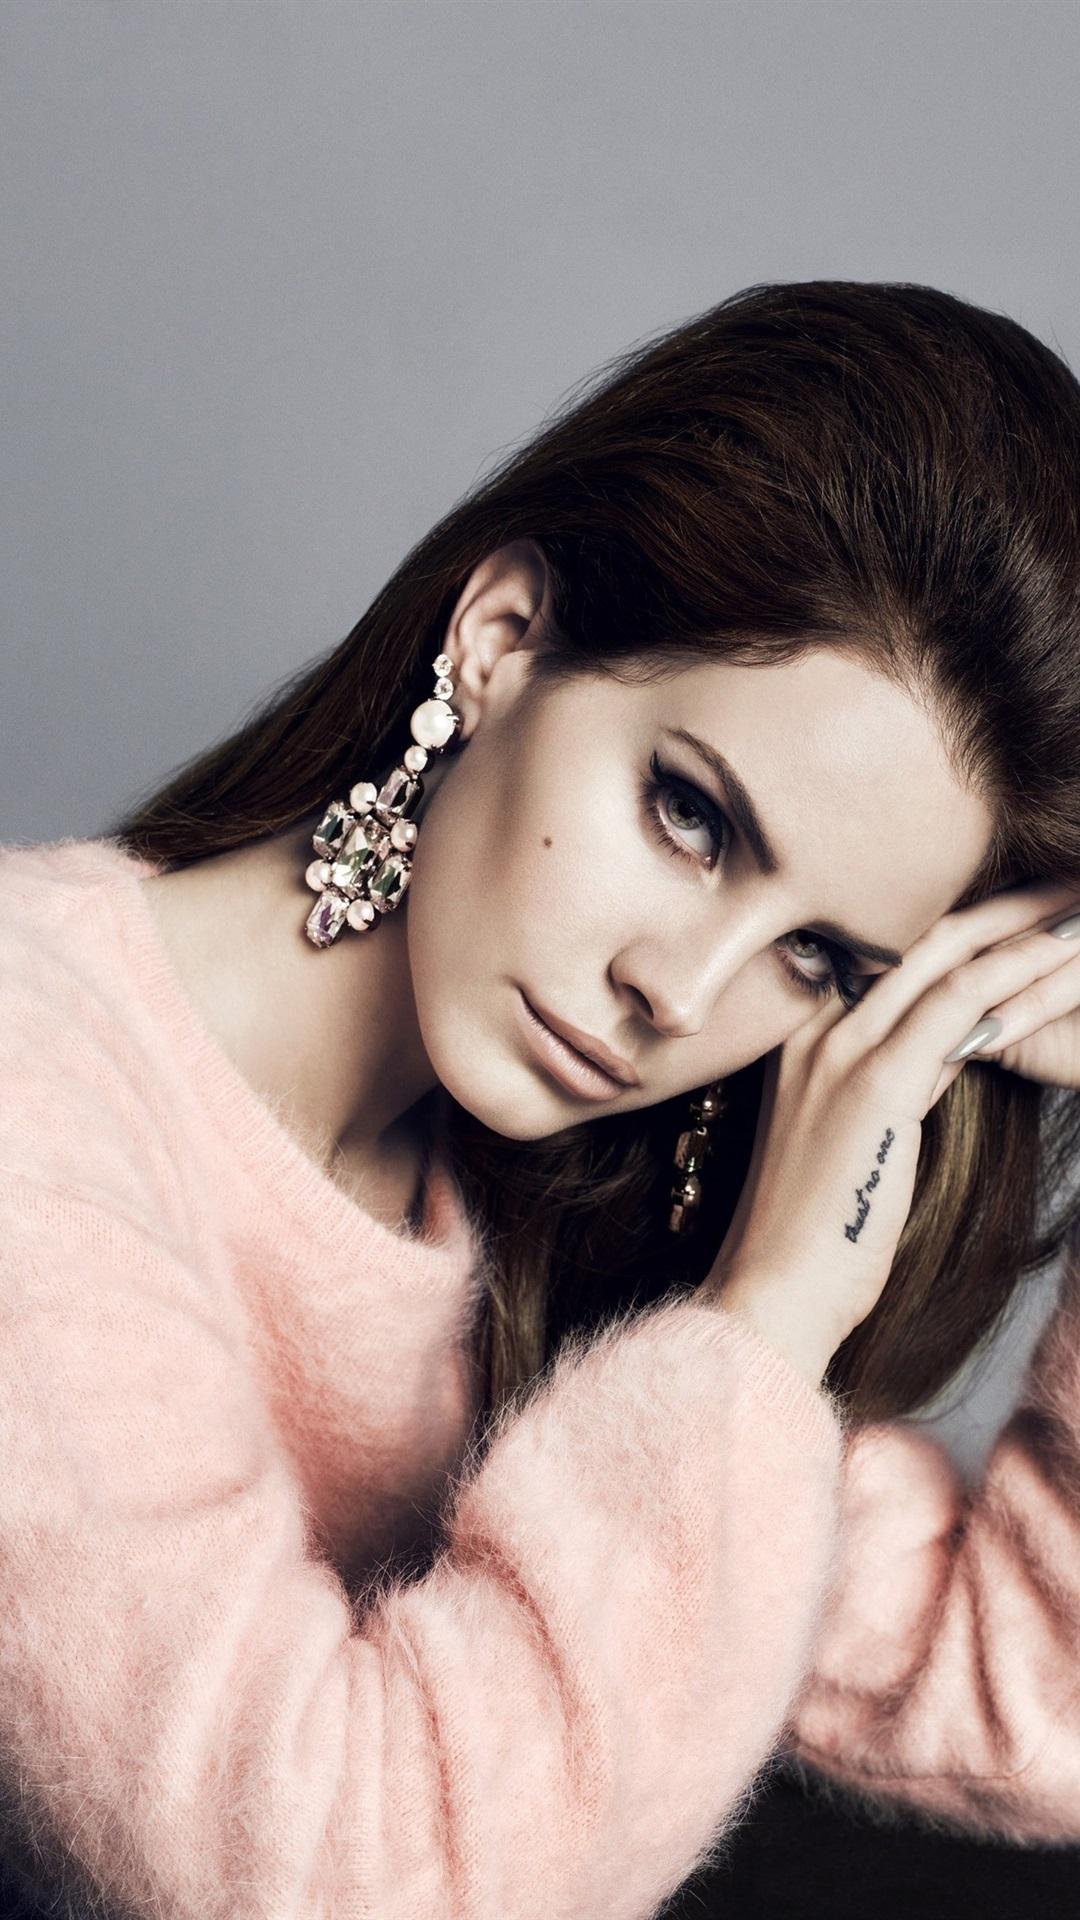 Lana Del Rey 09 1080x1920 Iphone 8 7 6 6s Plus Wallpaper